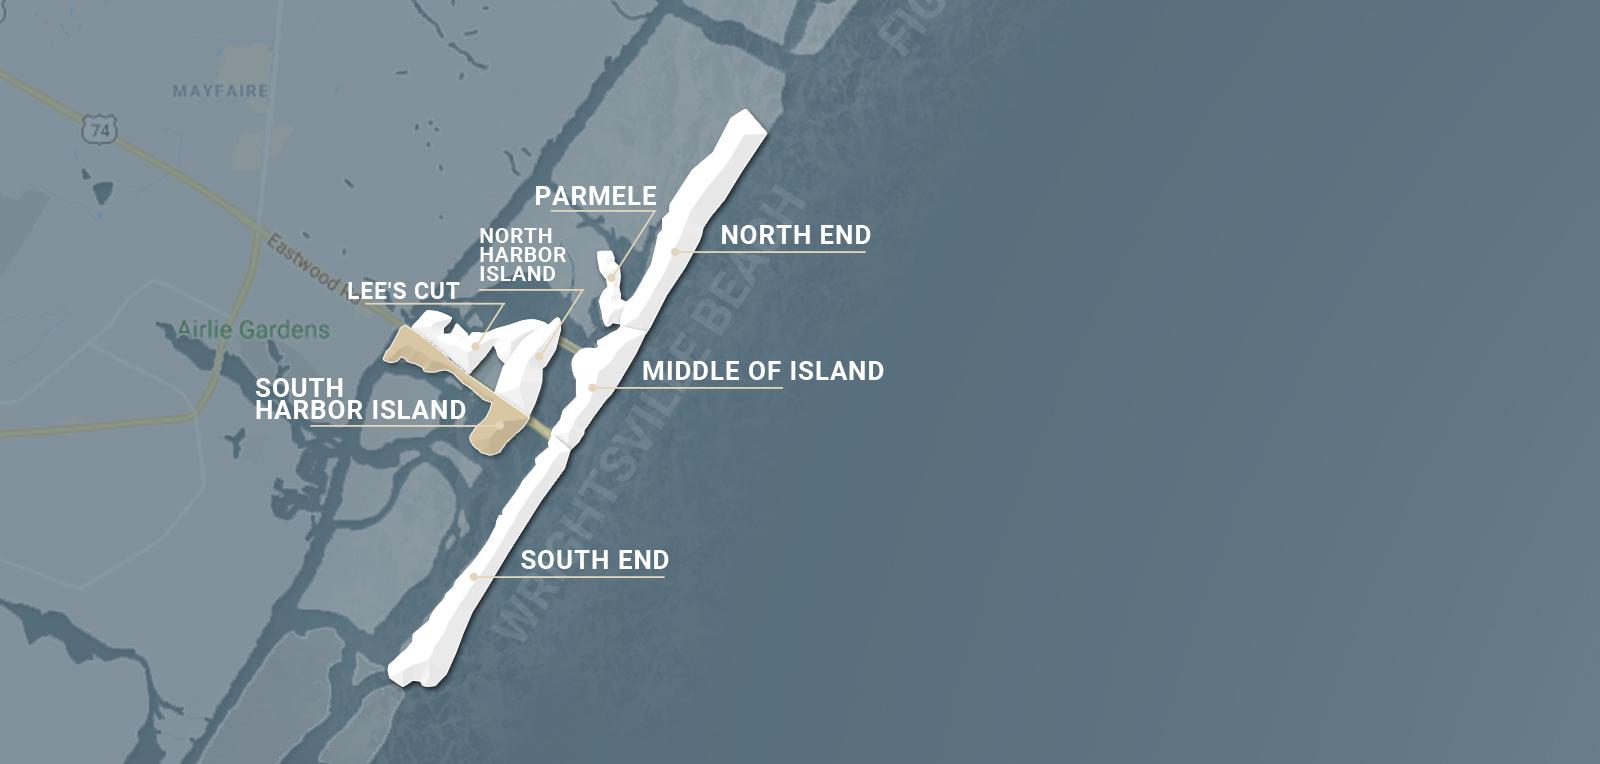 South Harbor Island